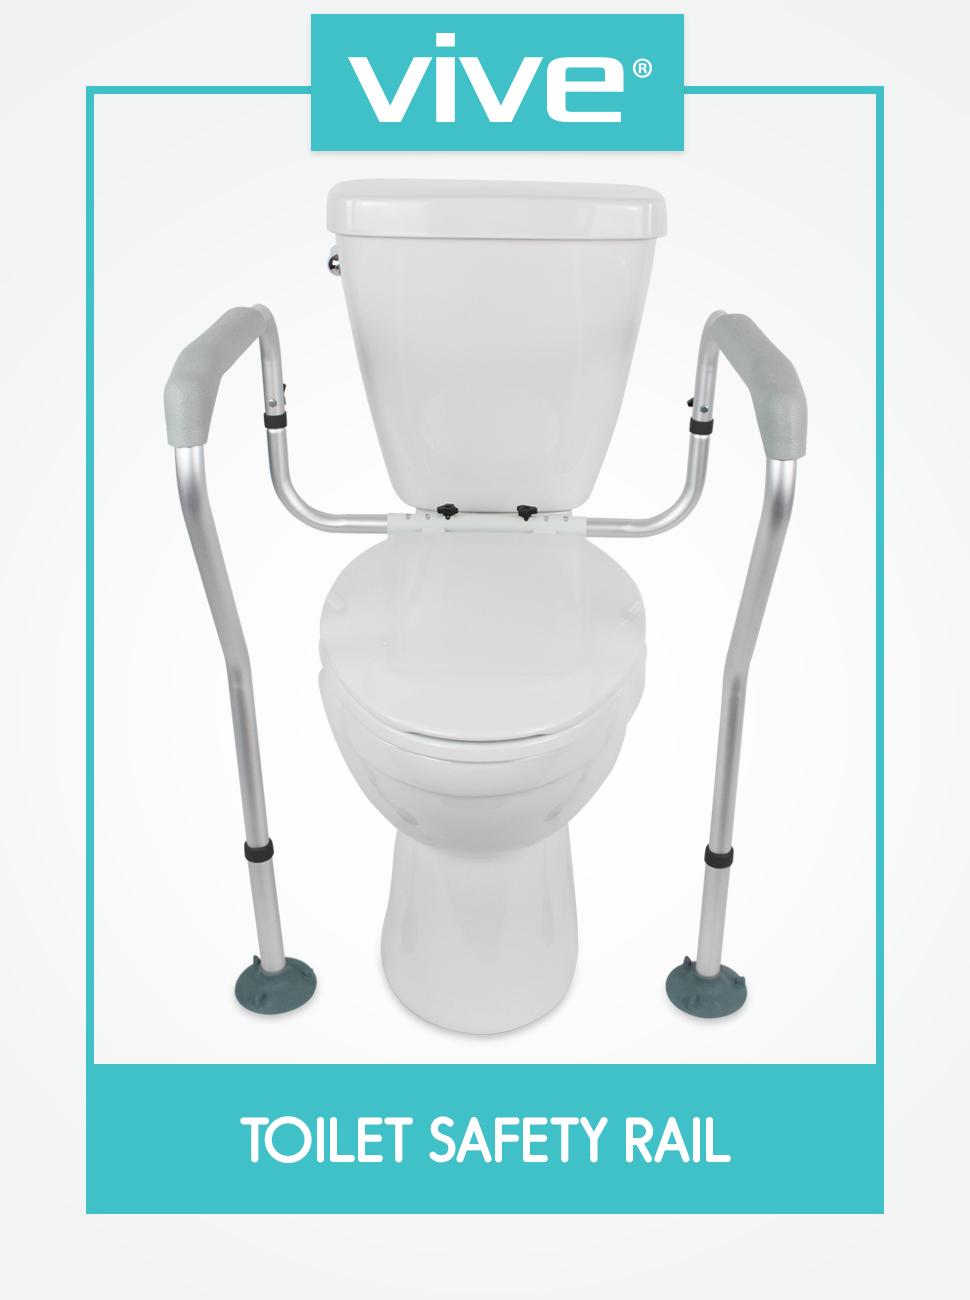 Vive Toilet Rail - Bathroom Safety Frame - Medical Railing Helper for Elderly, Handicap, Disable